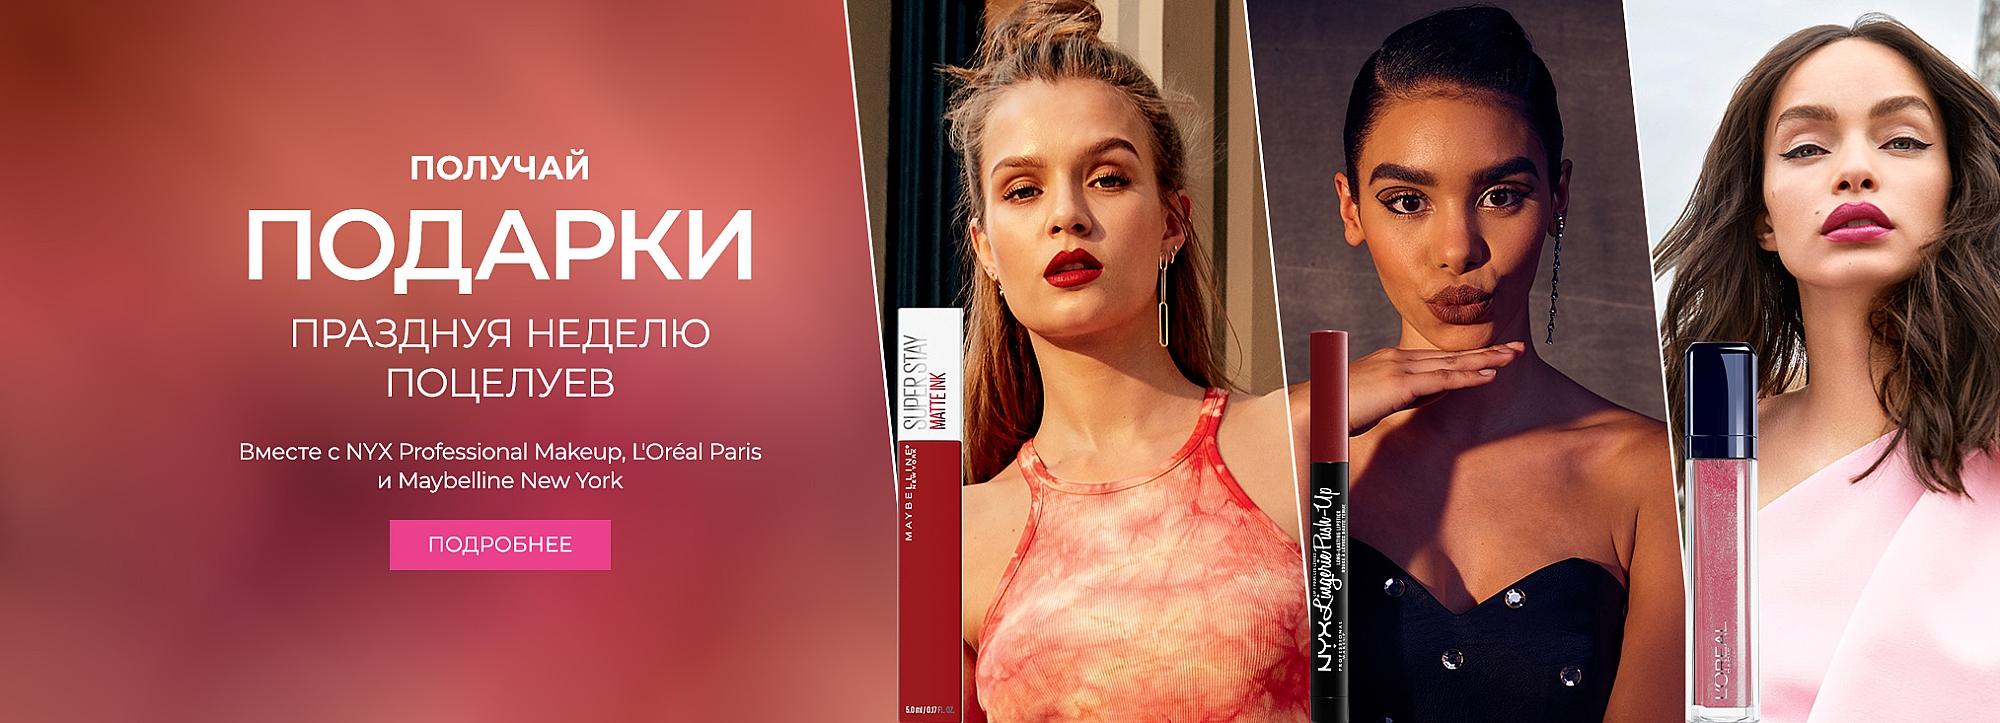 NYX Professional Makeup, L'Oreal Paris, Maybelline New York_2419